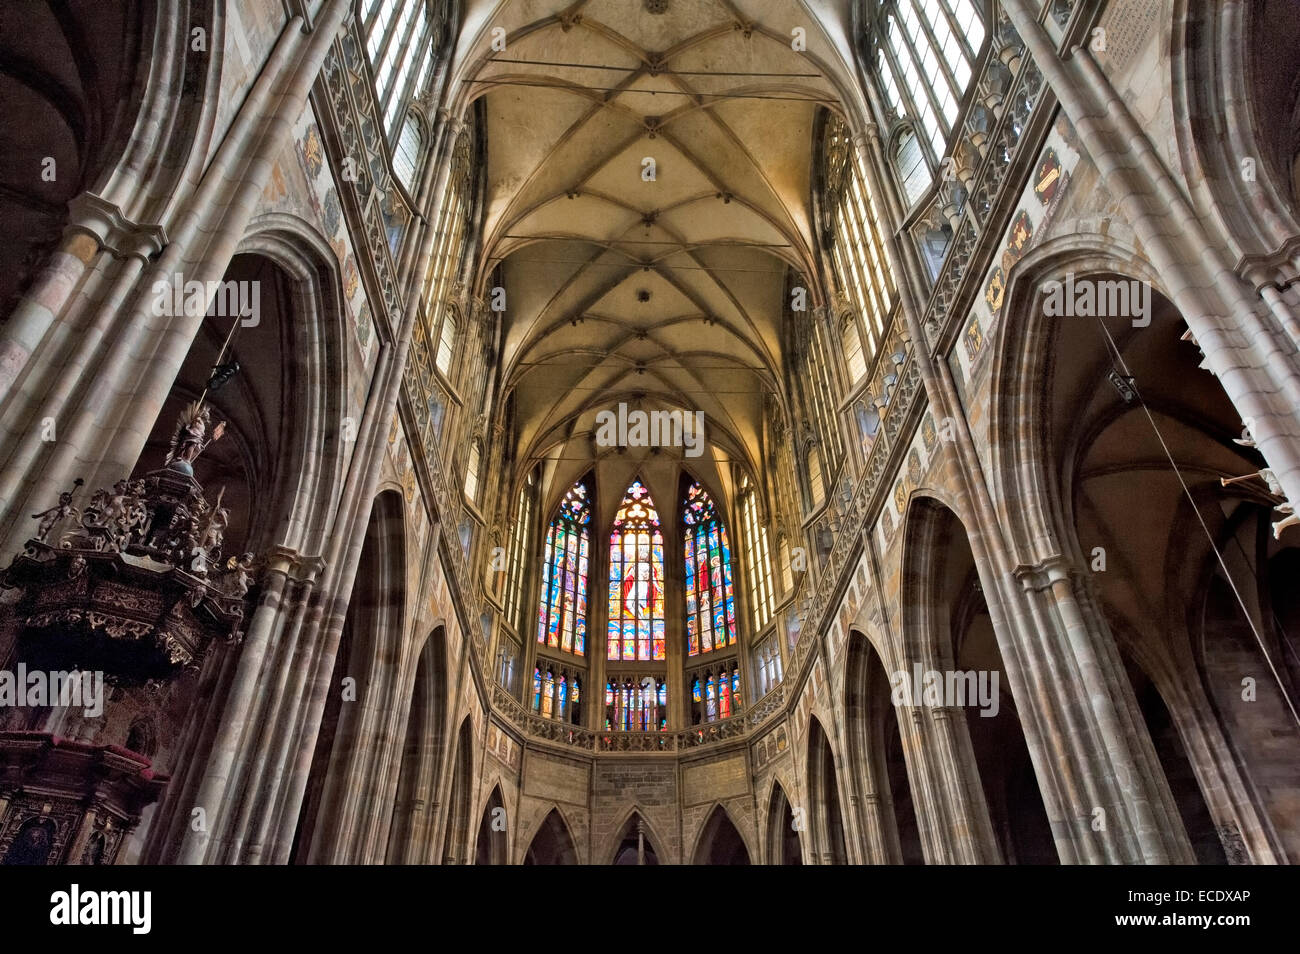 Gothic Interior Ceiling In Nave Of St Vituss Cathedral Pragues Distinctive Landmark Prazsky Hrad Castle District